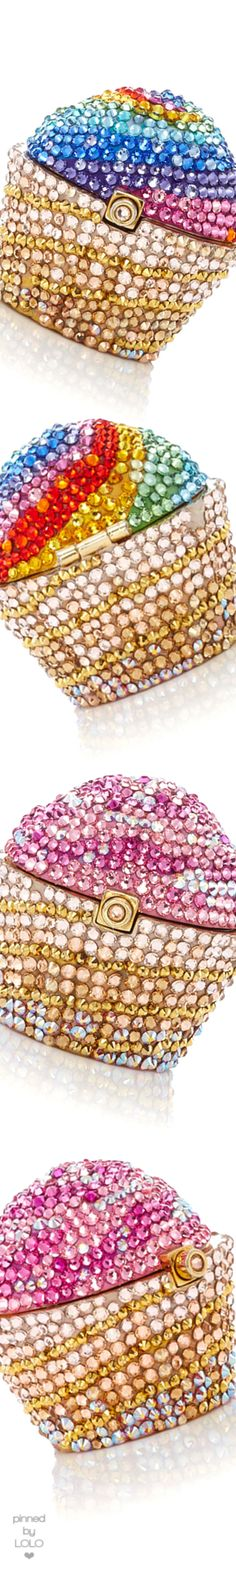 Judith Leiber Couture Cupcake Pillbox